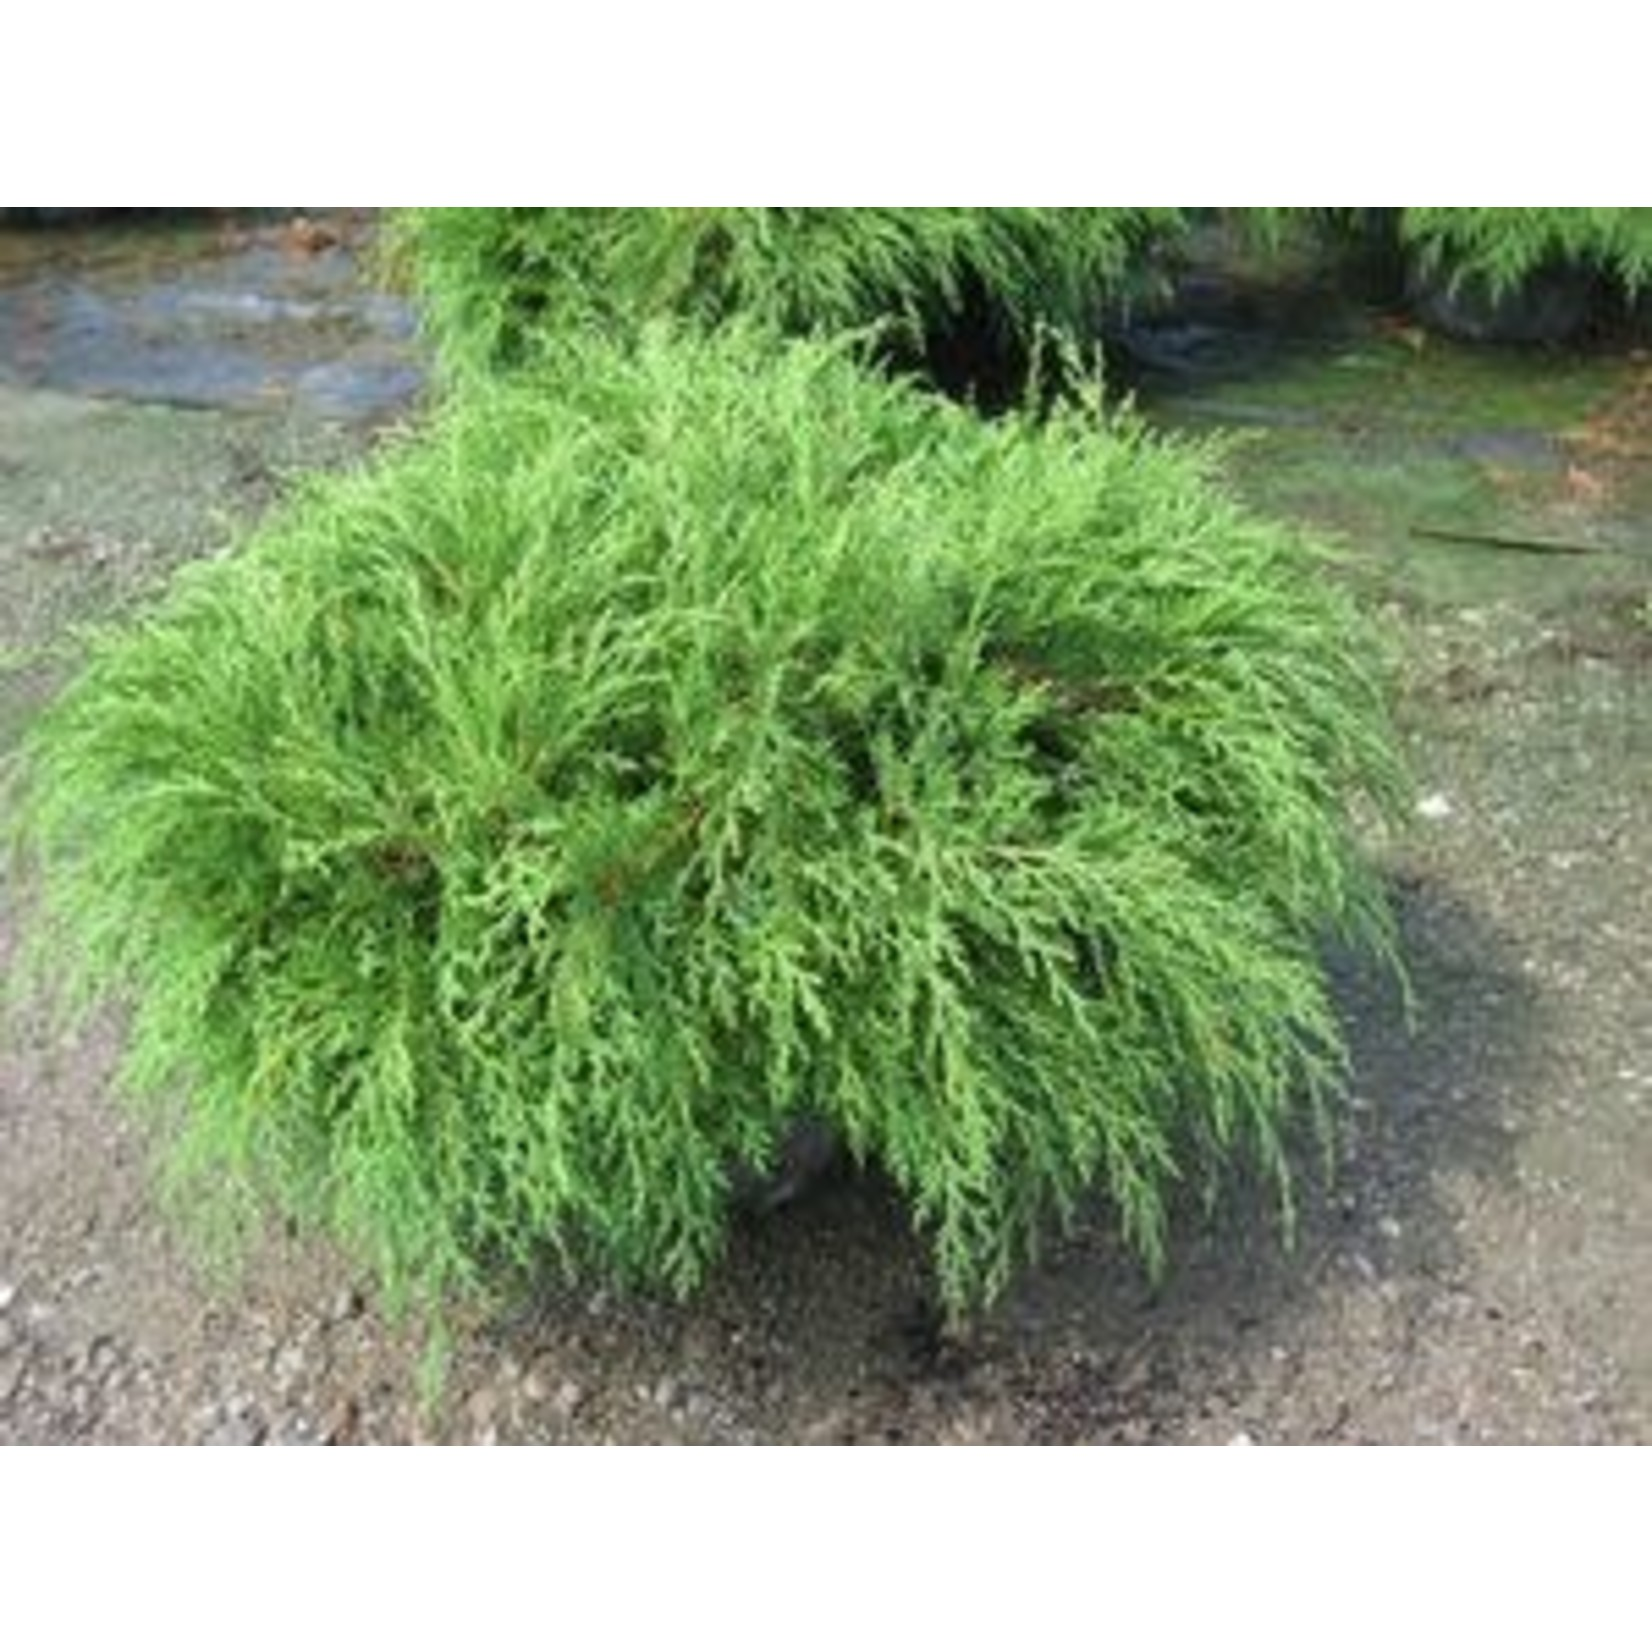 Russian Cypress 'celtic pride' 2 gal